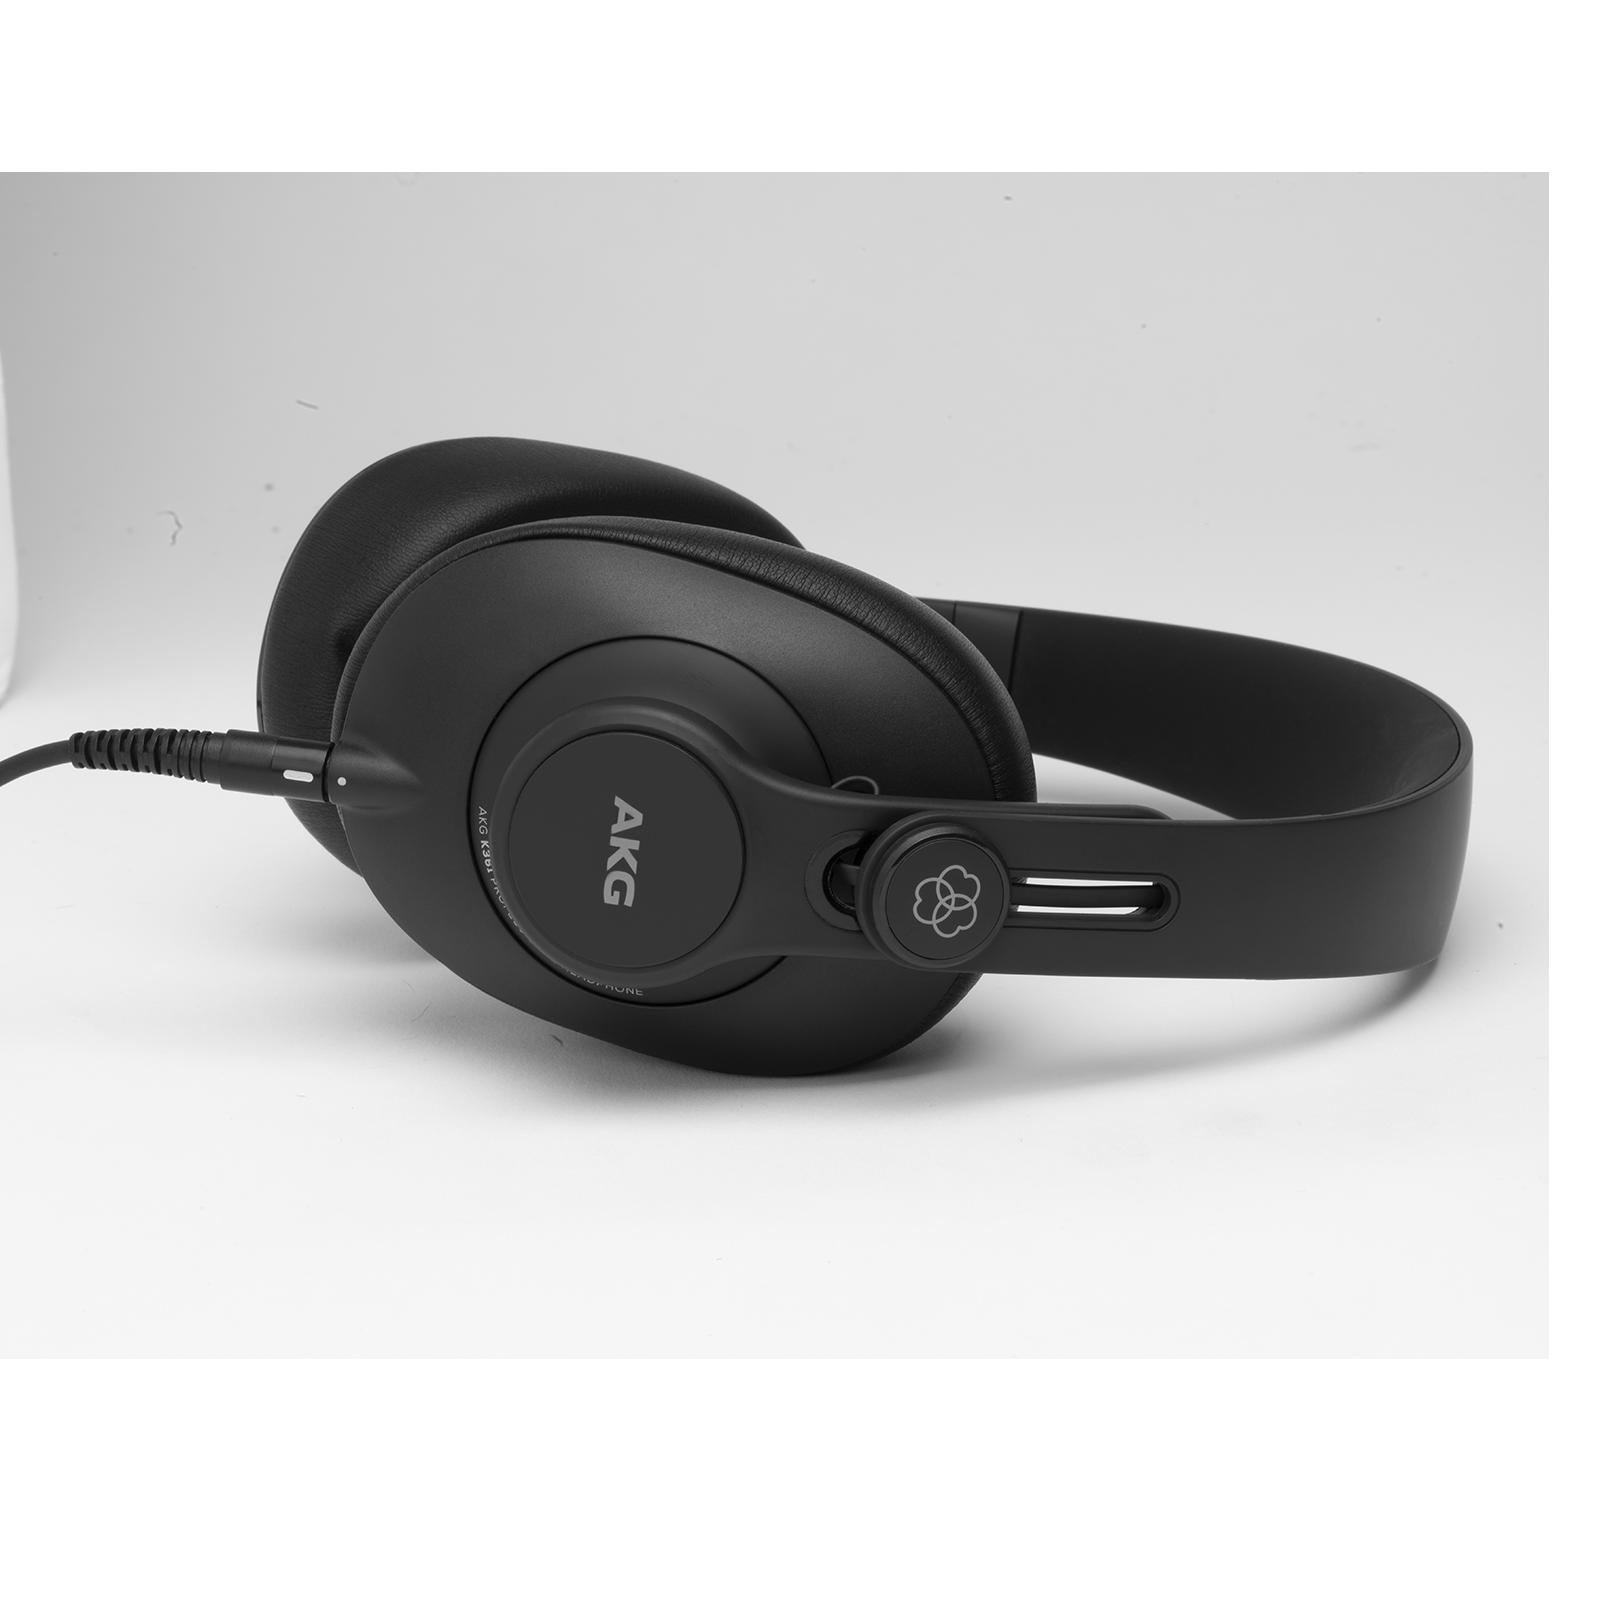 K361 - Black - Over-ear, closed-back, foldable studio headphones - Left